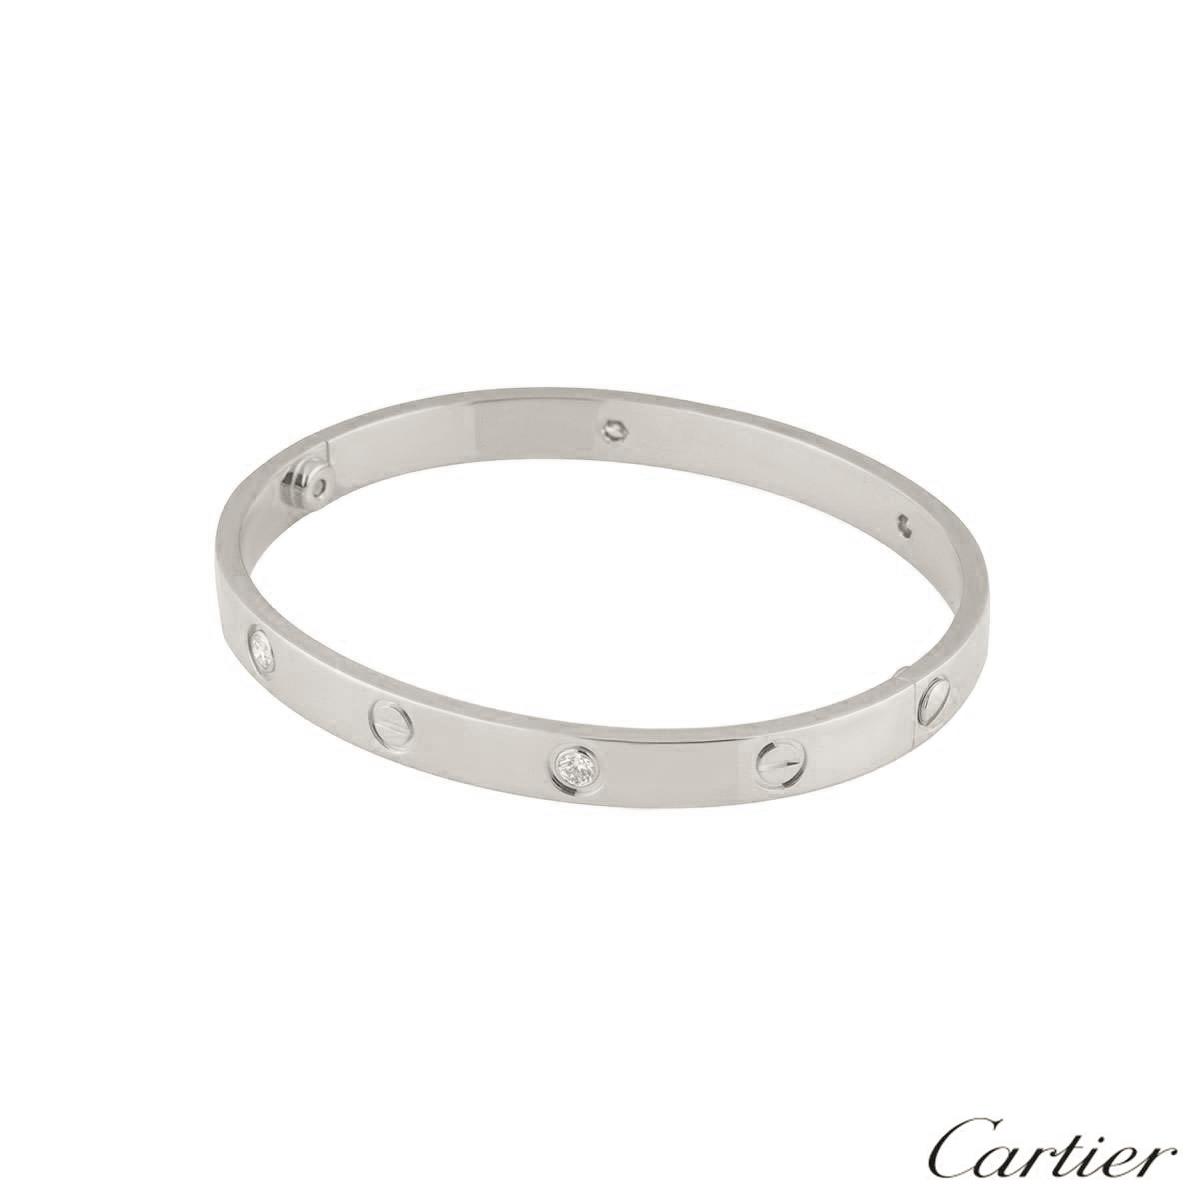 Cartier White Gold Half Diamond Love Bracelet Size 18 B6035818